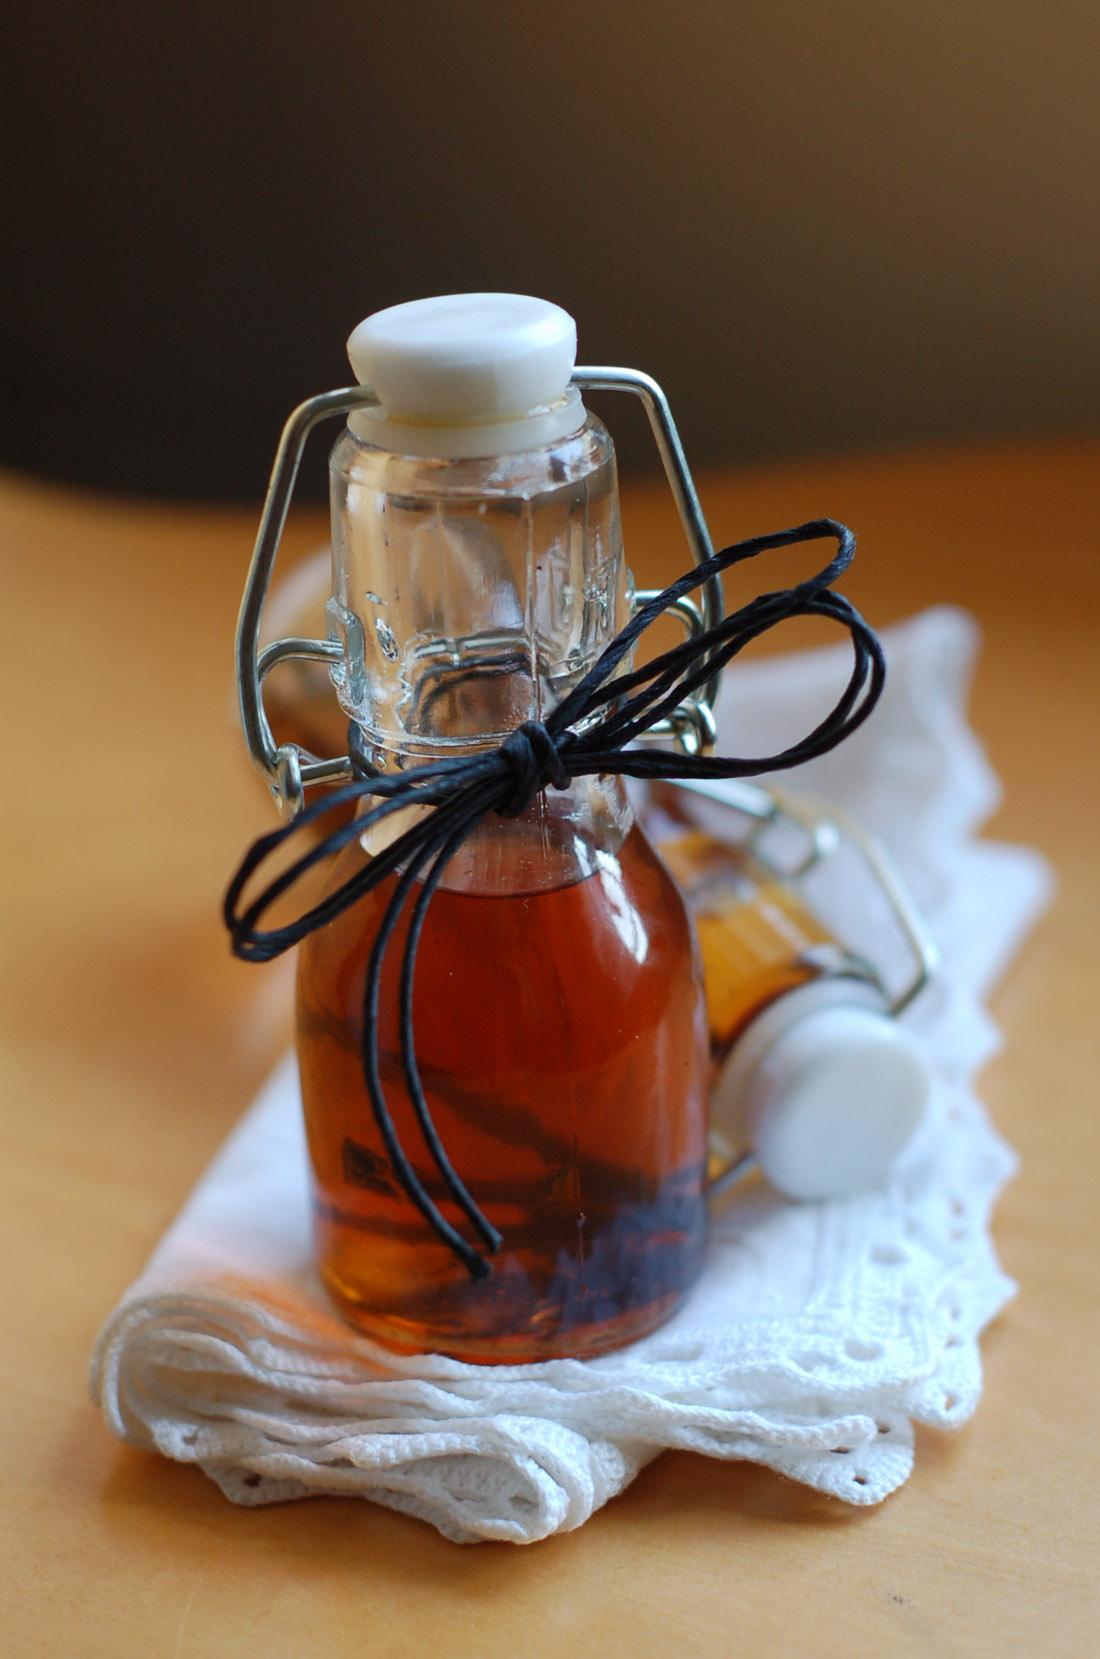 extracto de baunilha // vanilla extract